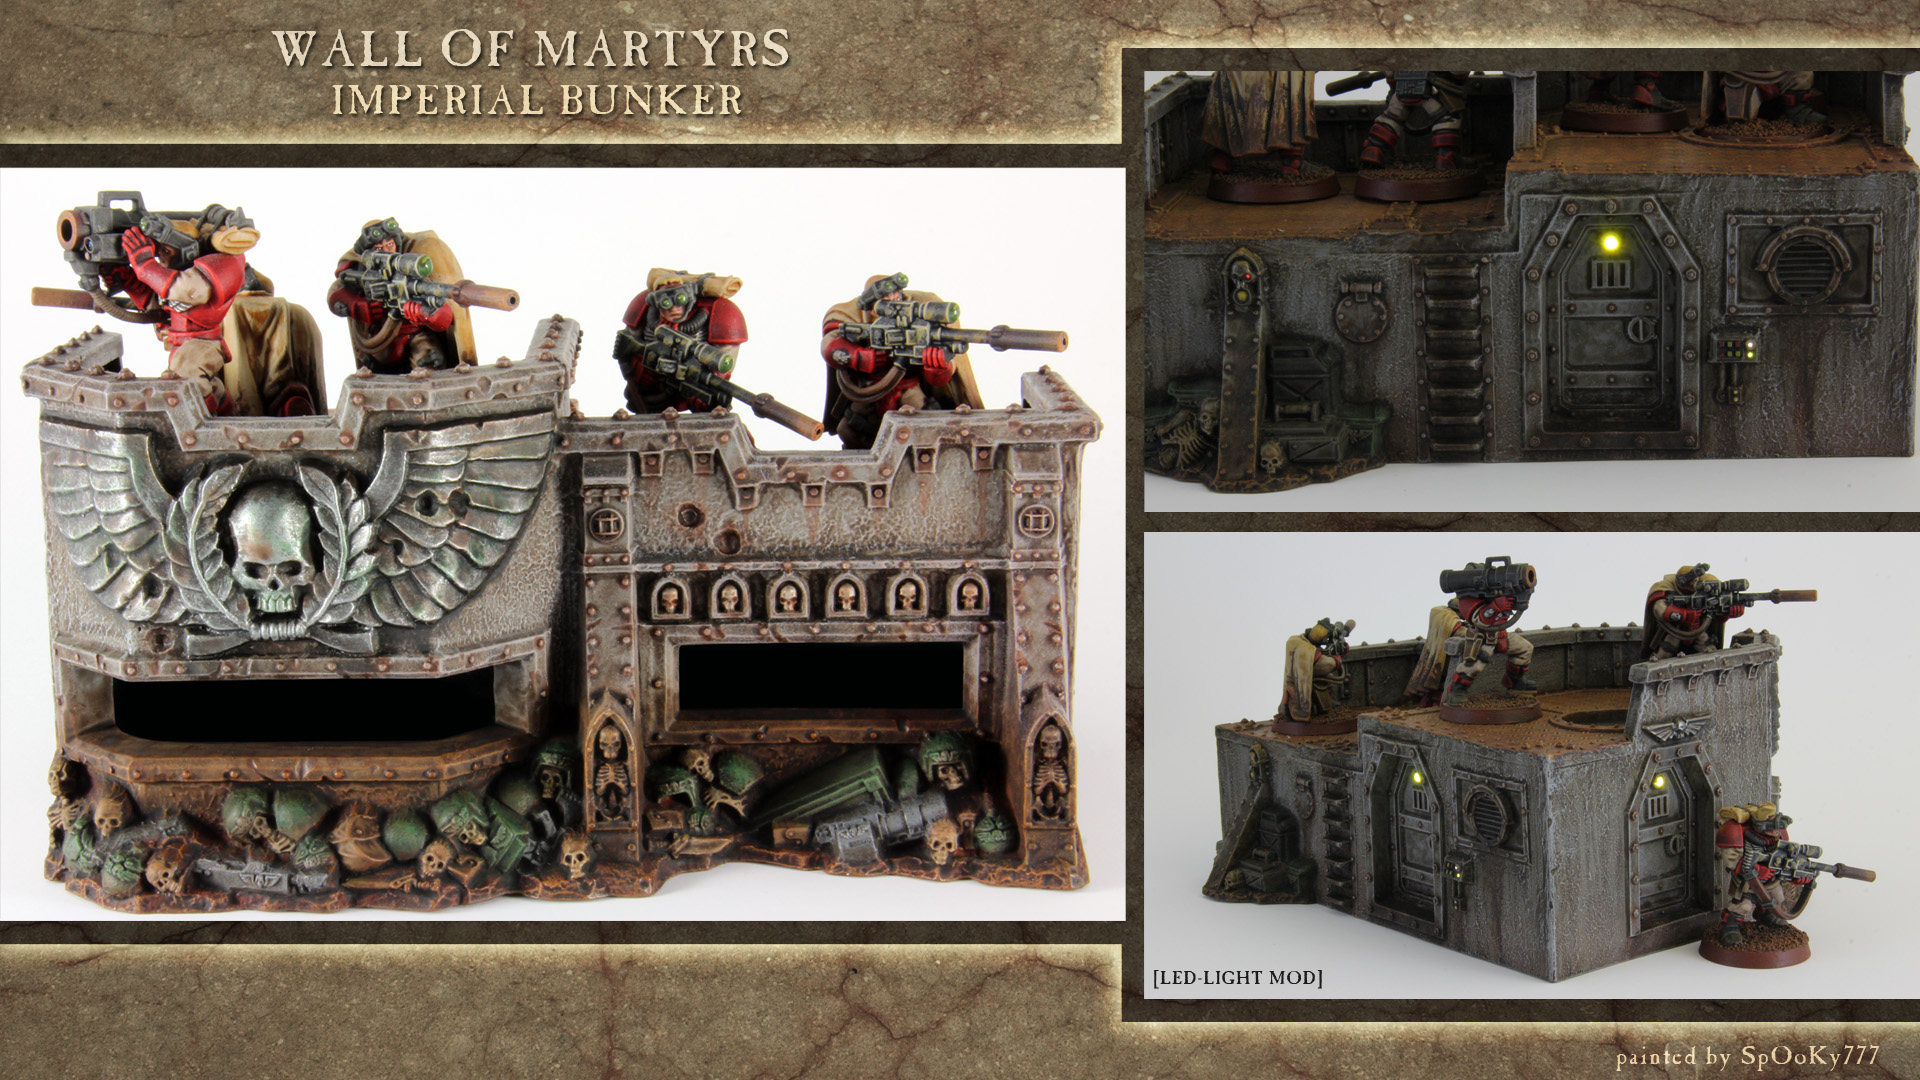 Imperial Bunker by SpOoKy777